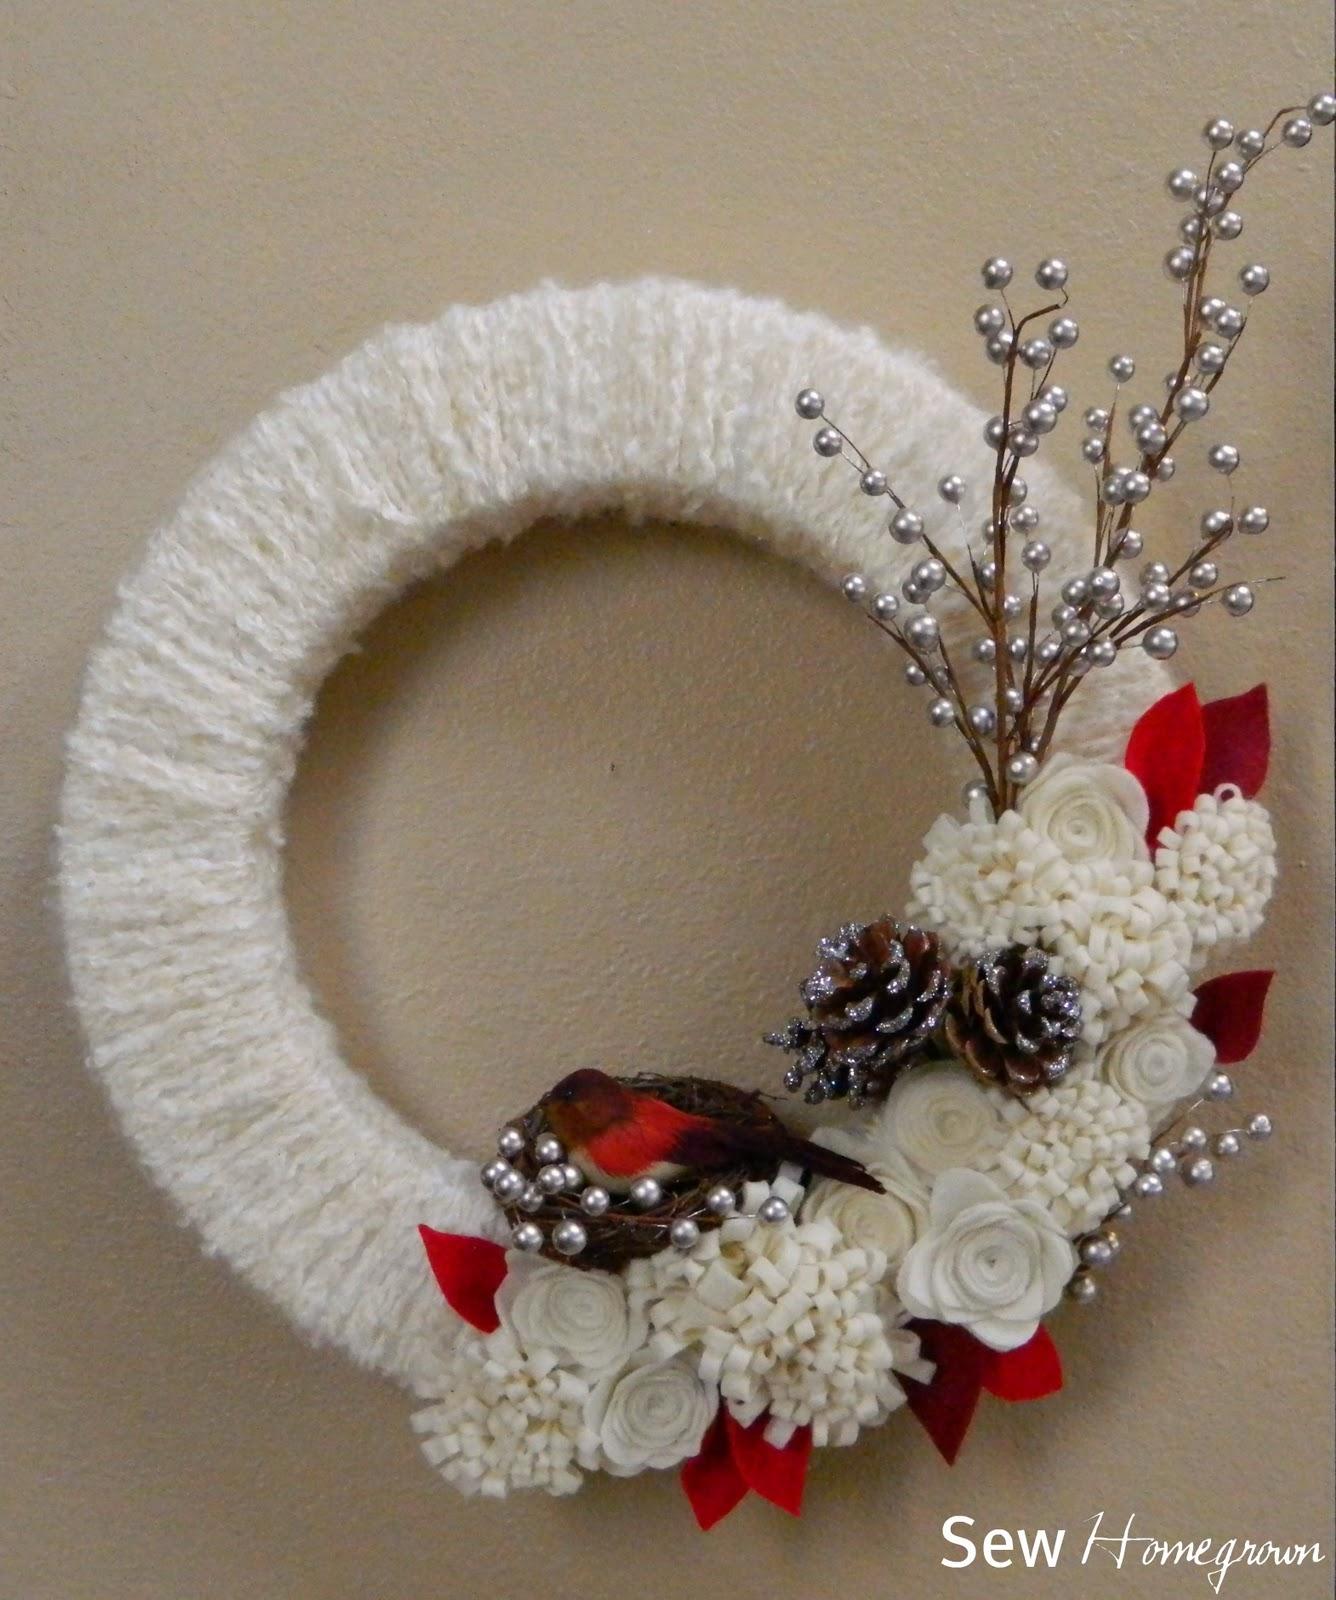 Sew Homegrown: {DIY} Woodland Winter Wreath